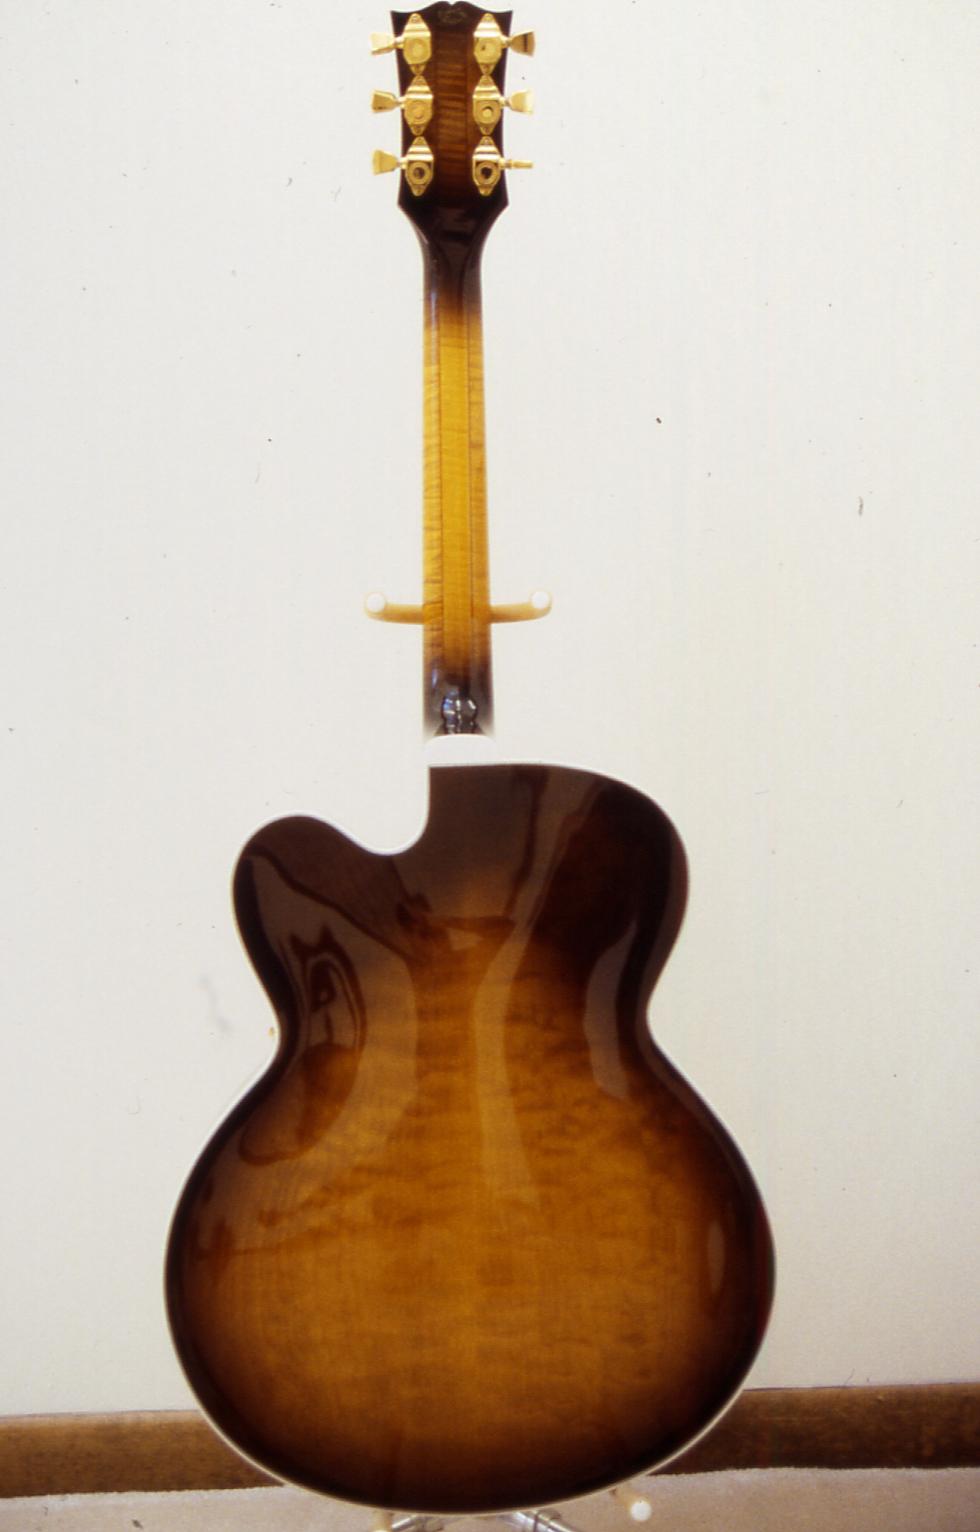 Your Gibson L-5 Choice-l-5c-1987-rear-jpg